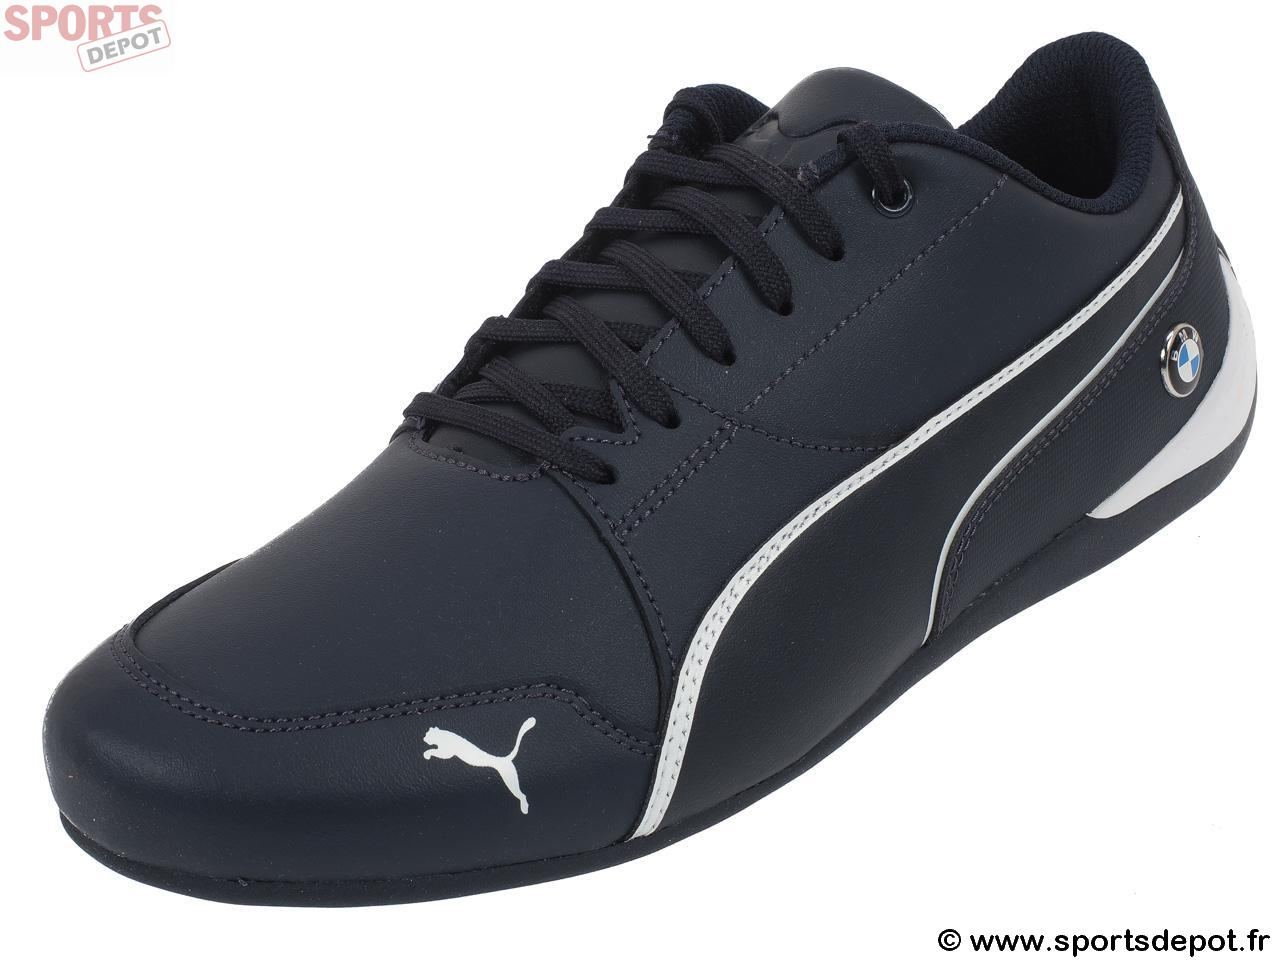 e786c227726d9 Acheter Chaussures mode ville PUMA Bmw drift cat 7 nv jr - Enfant ...